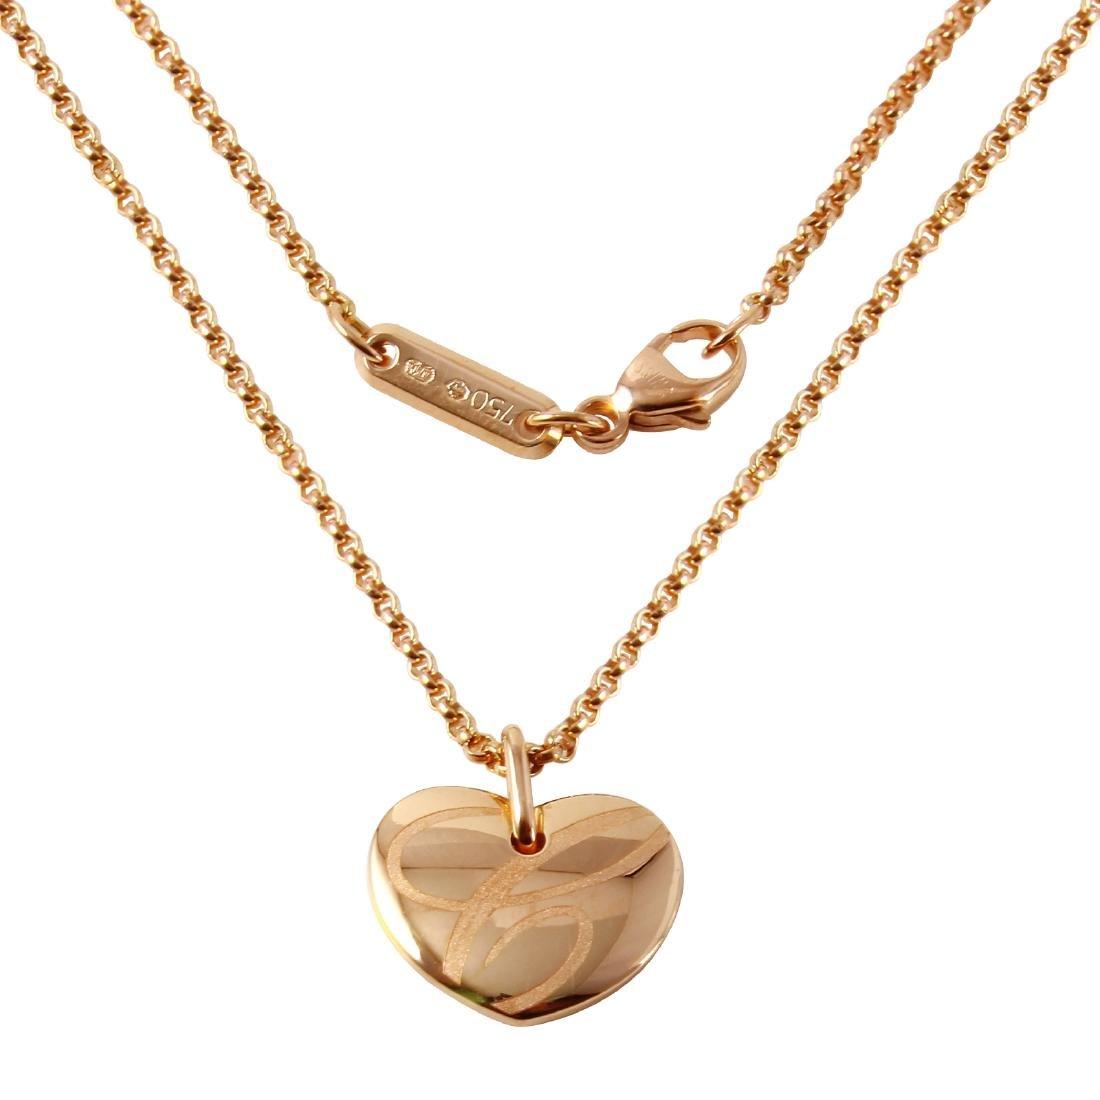 Chopard 18KT Rose Gold Heart Necklace